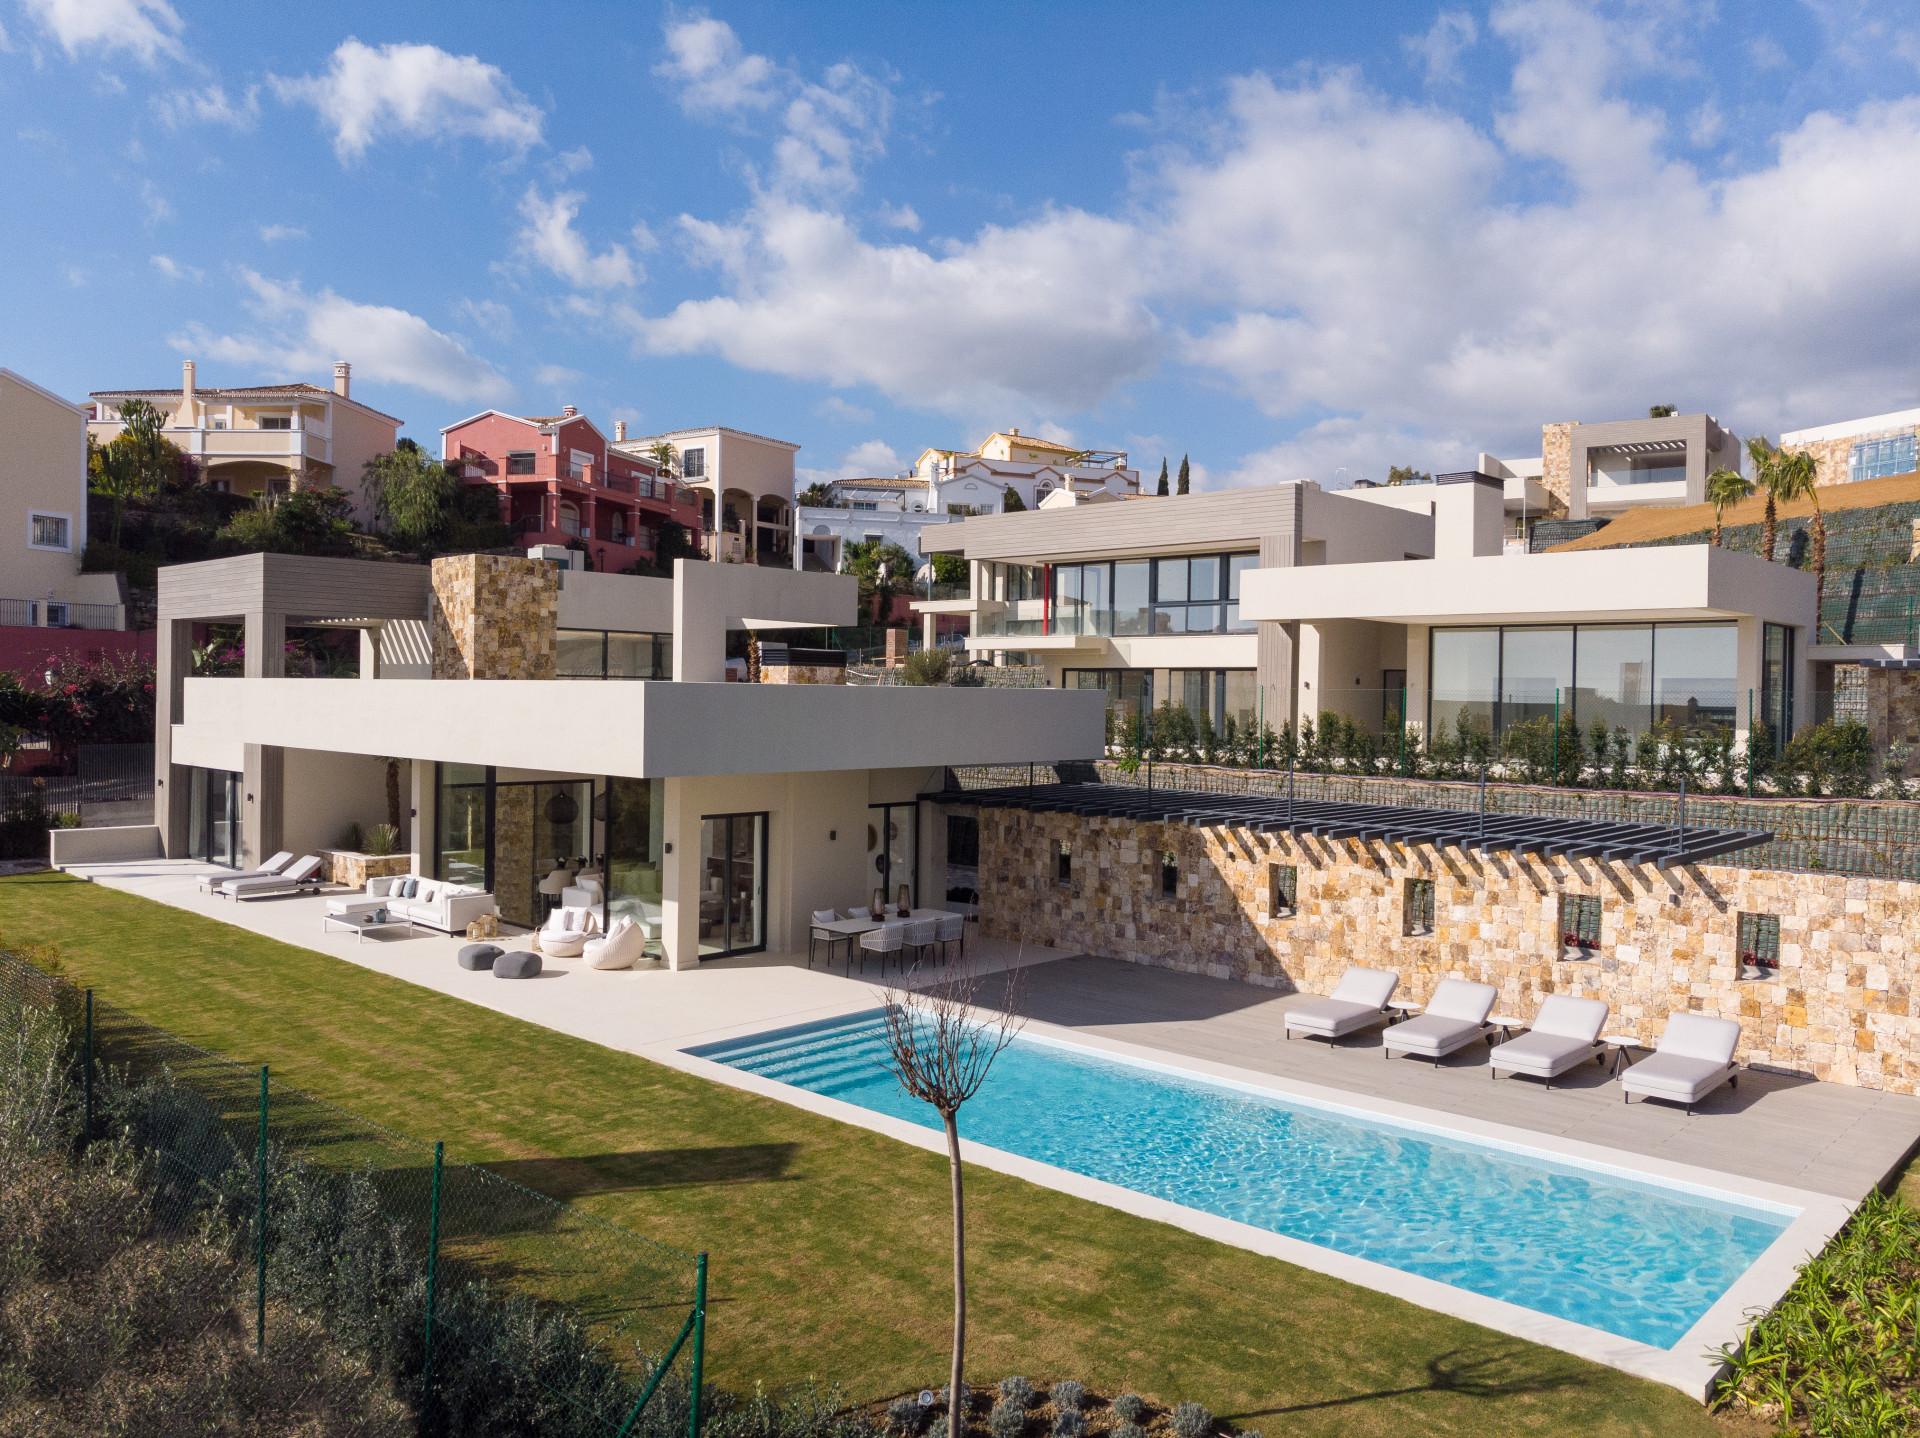 Refurbished modern Andalusian villa for sale in Nueva Andalucía – Aloha -  Marbella